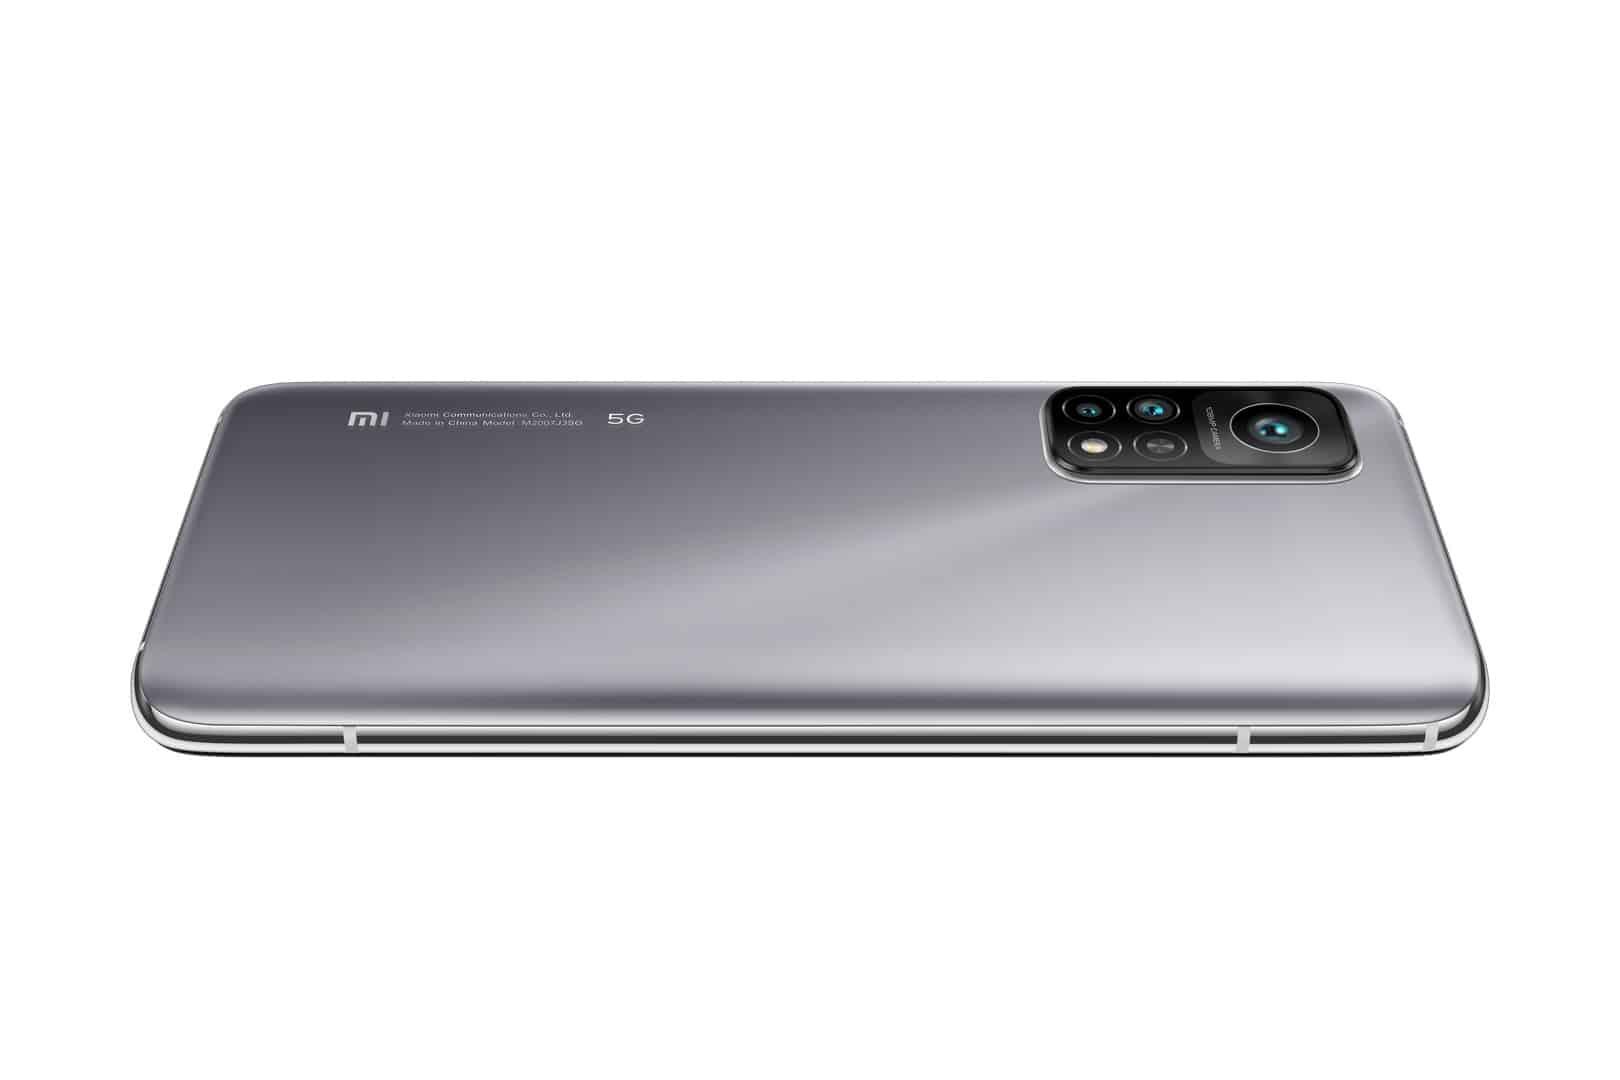 Xiaomi Mi 10T Pro image 15